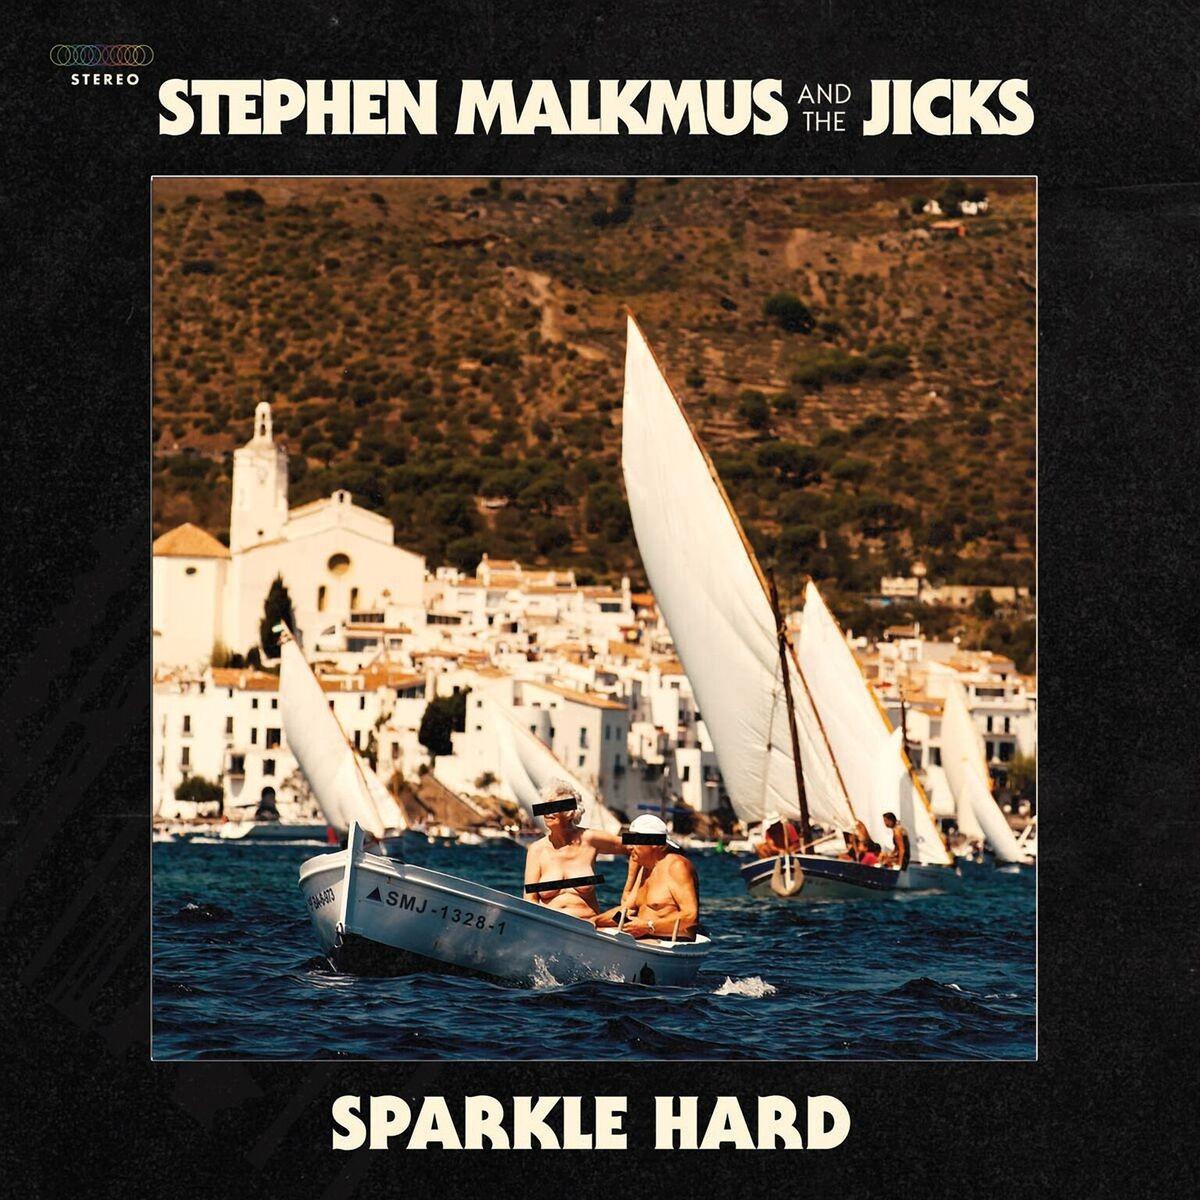 Stephen Malkmus and the Jicks Sparkle Hard Review